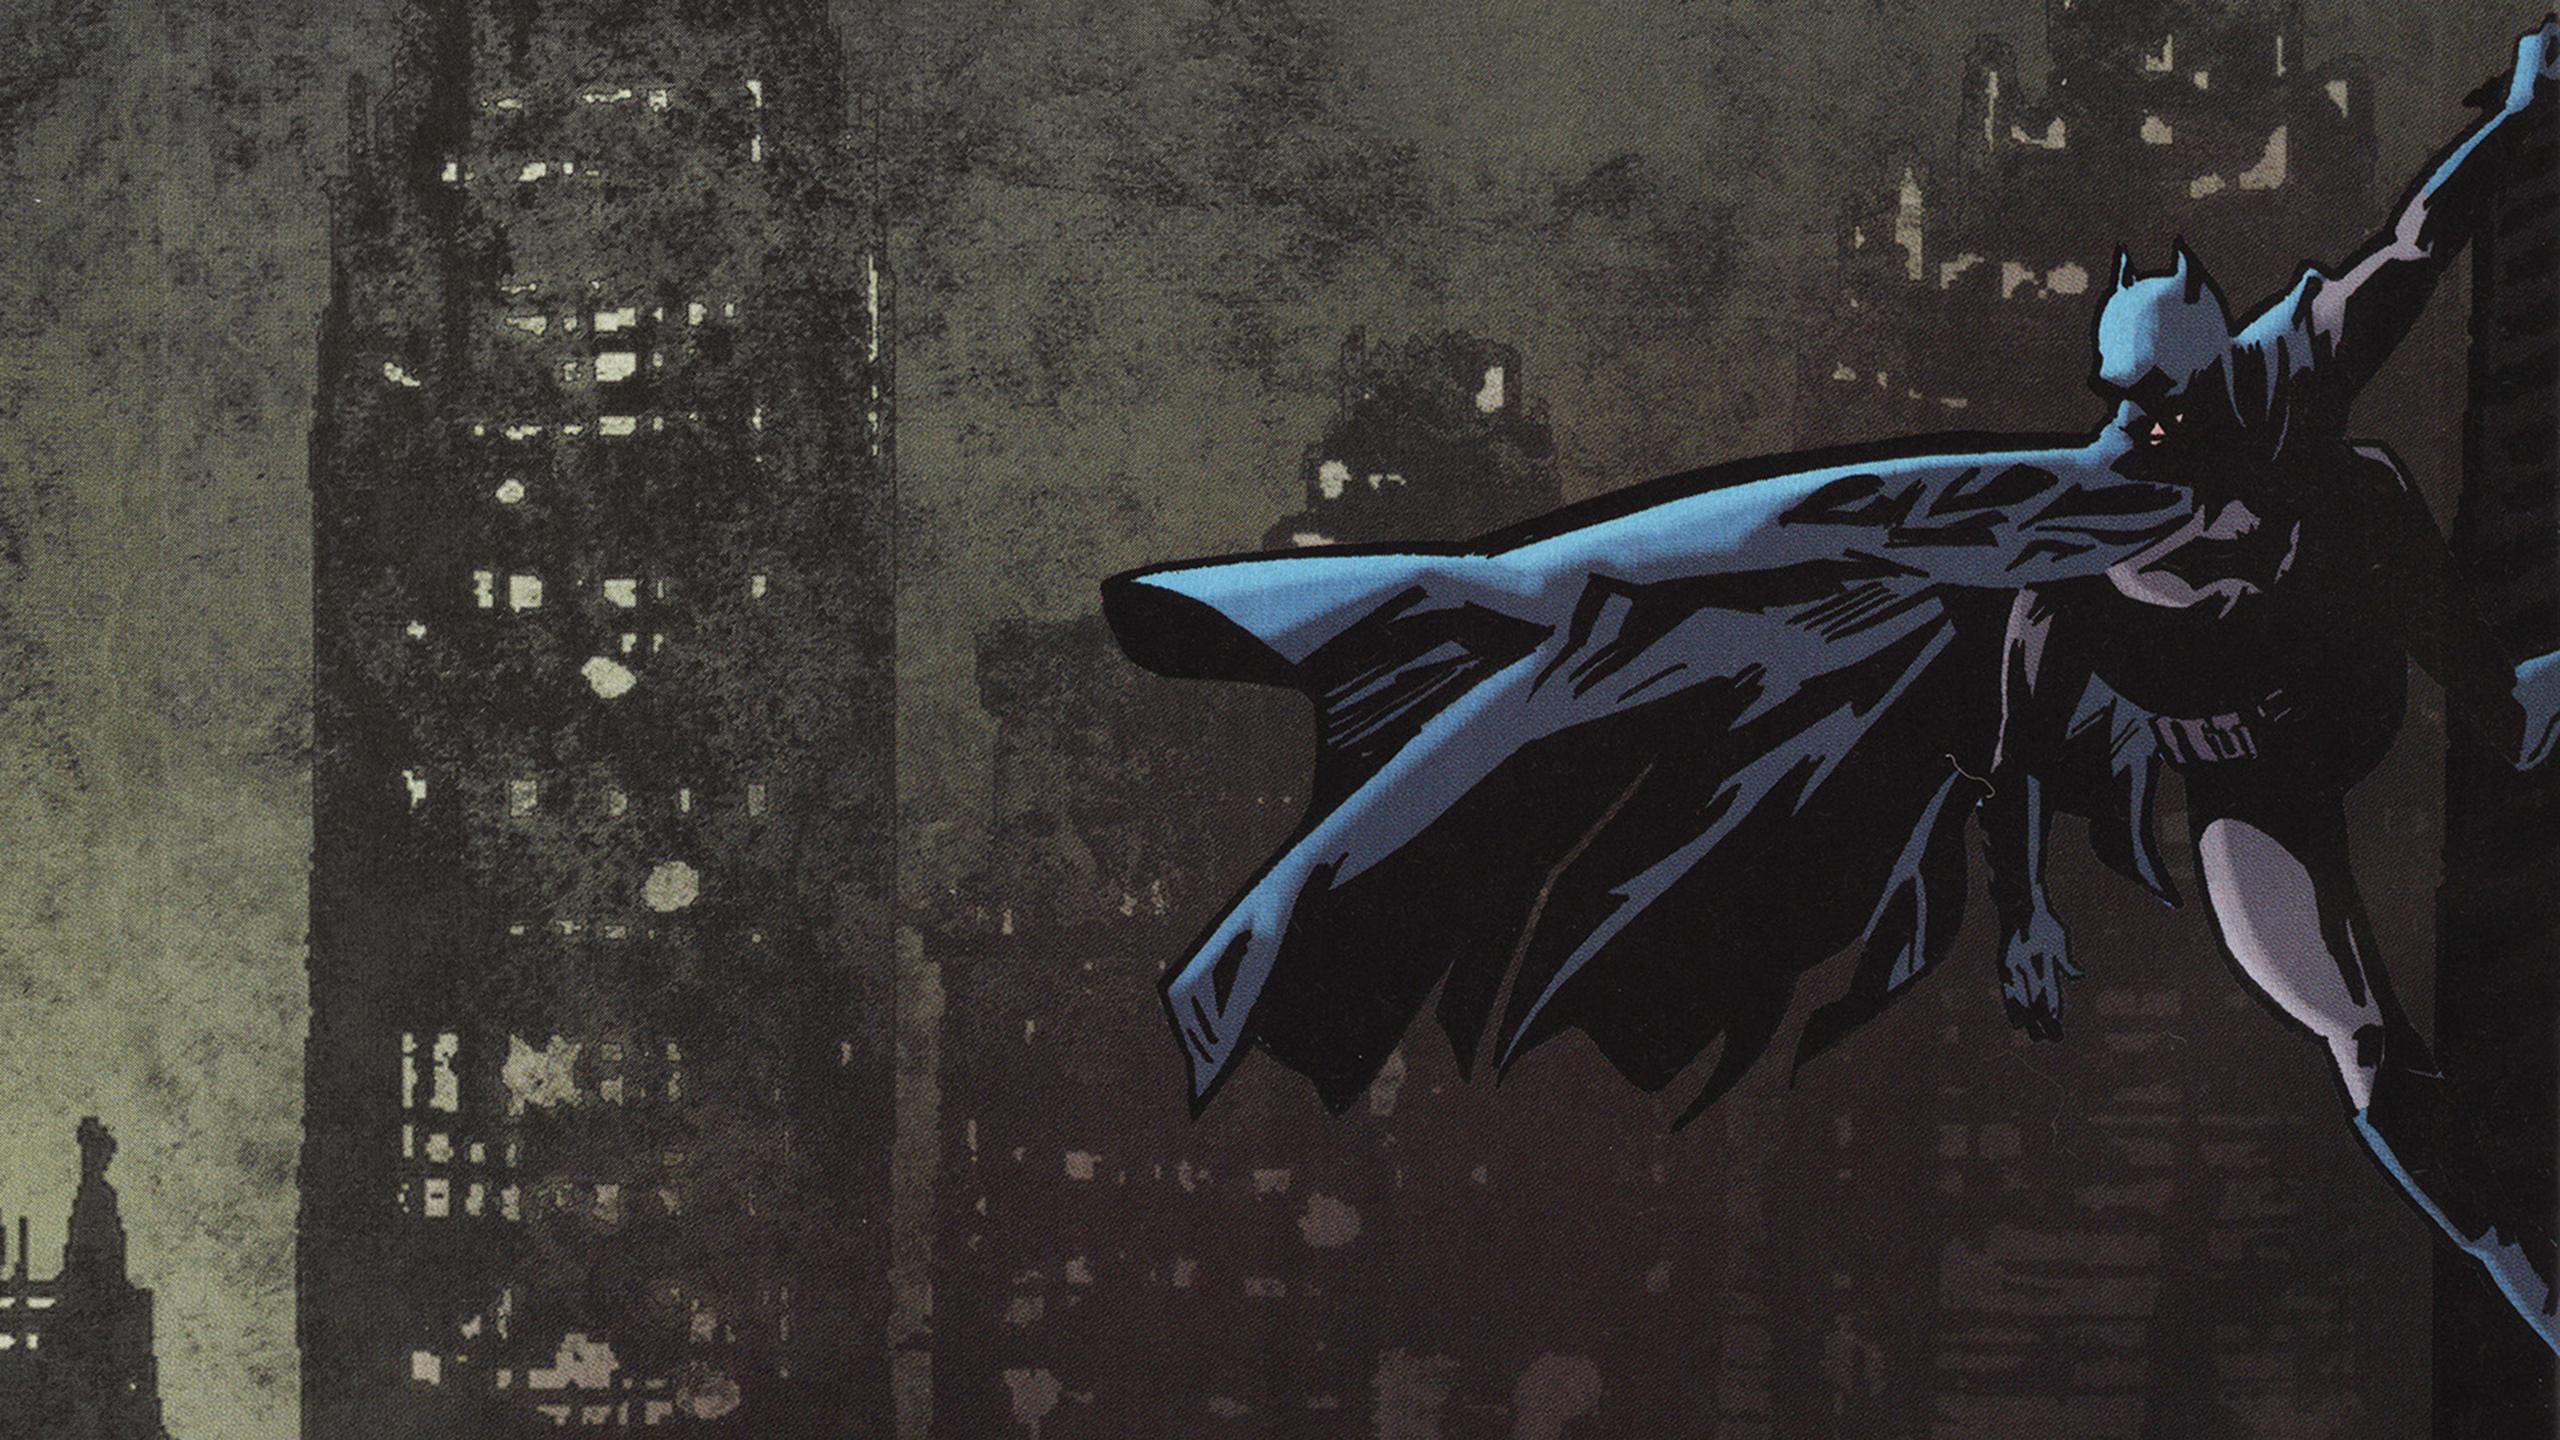 2560x1440 batman art hd 1440p resolution hd 4k wallpapers for Sfondi batman